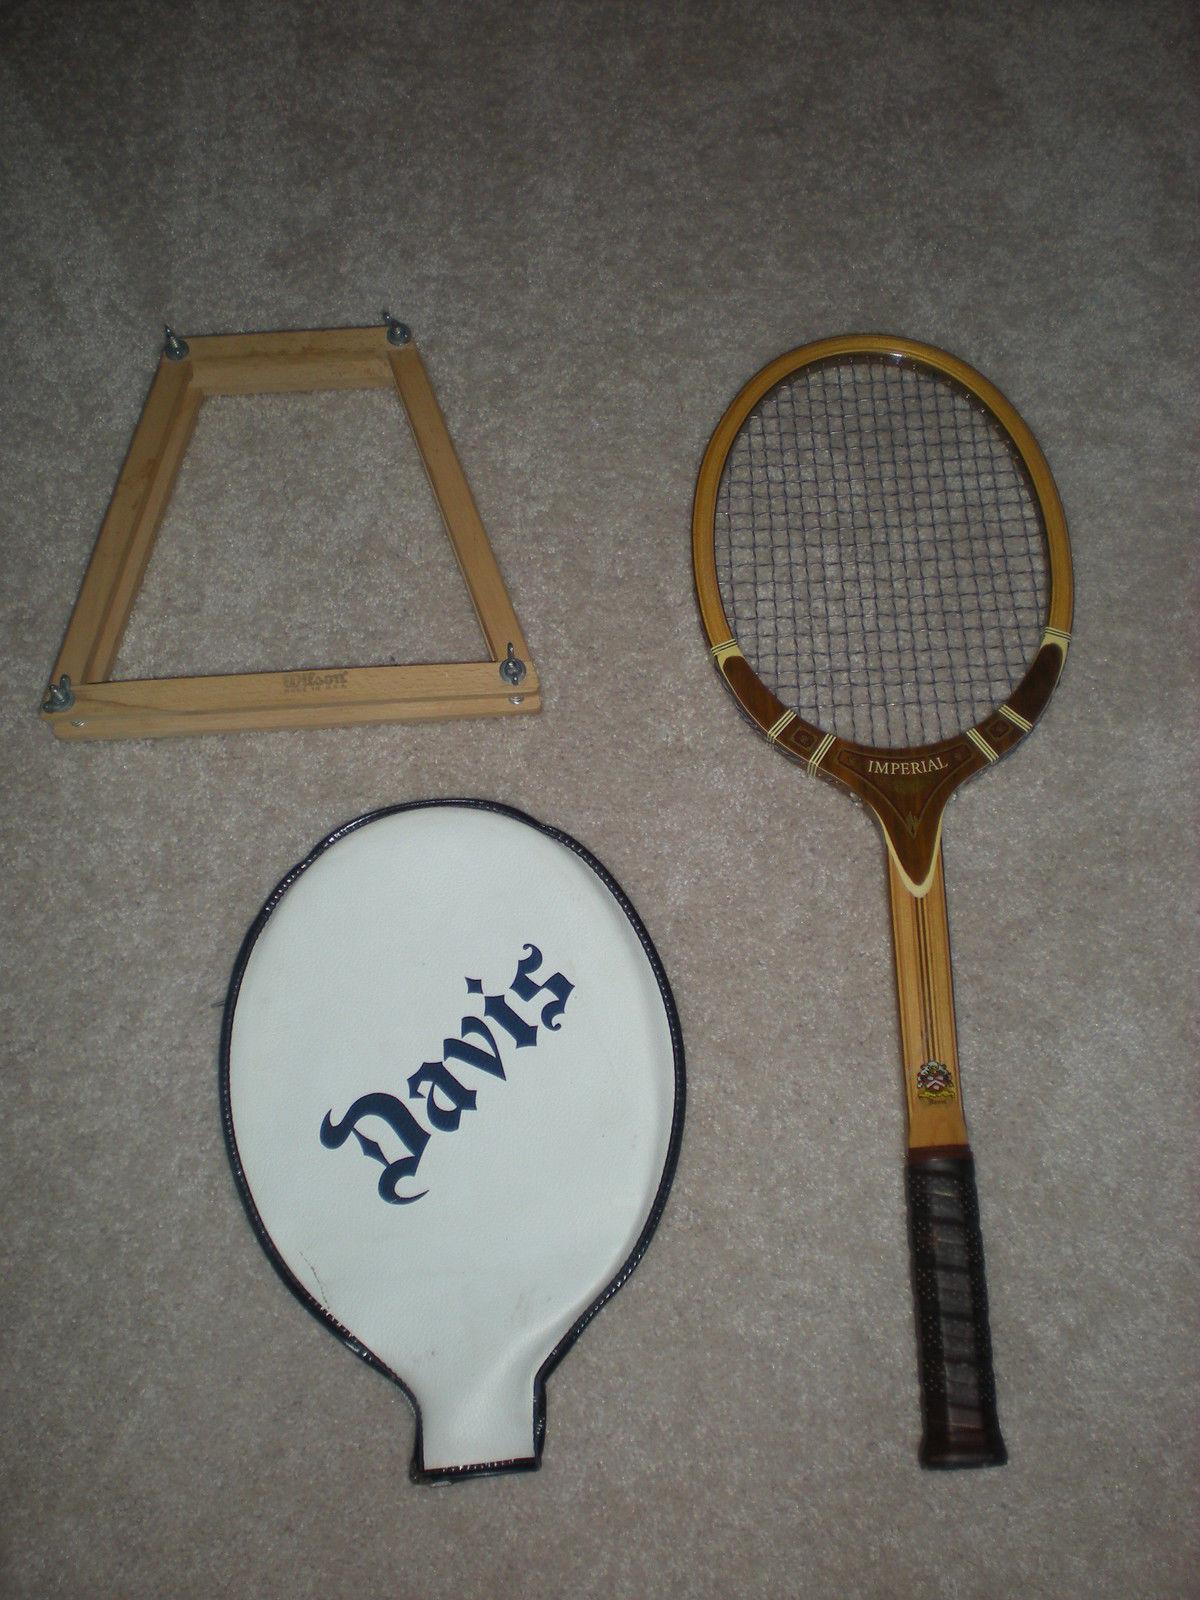 Vintage Tennis Raquet 78